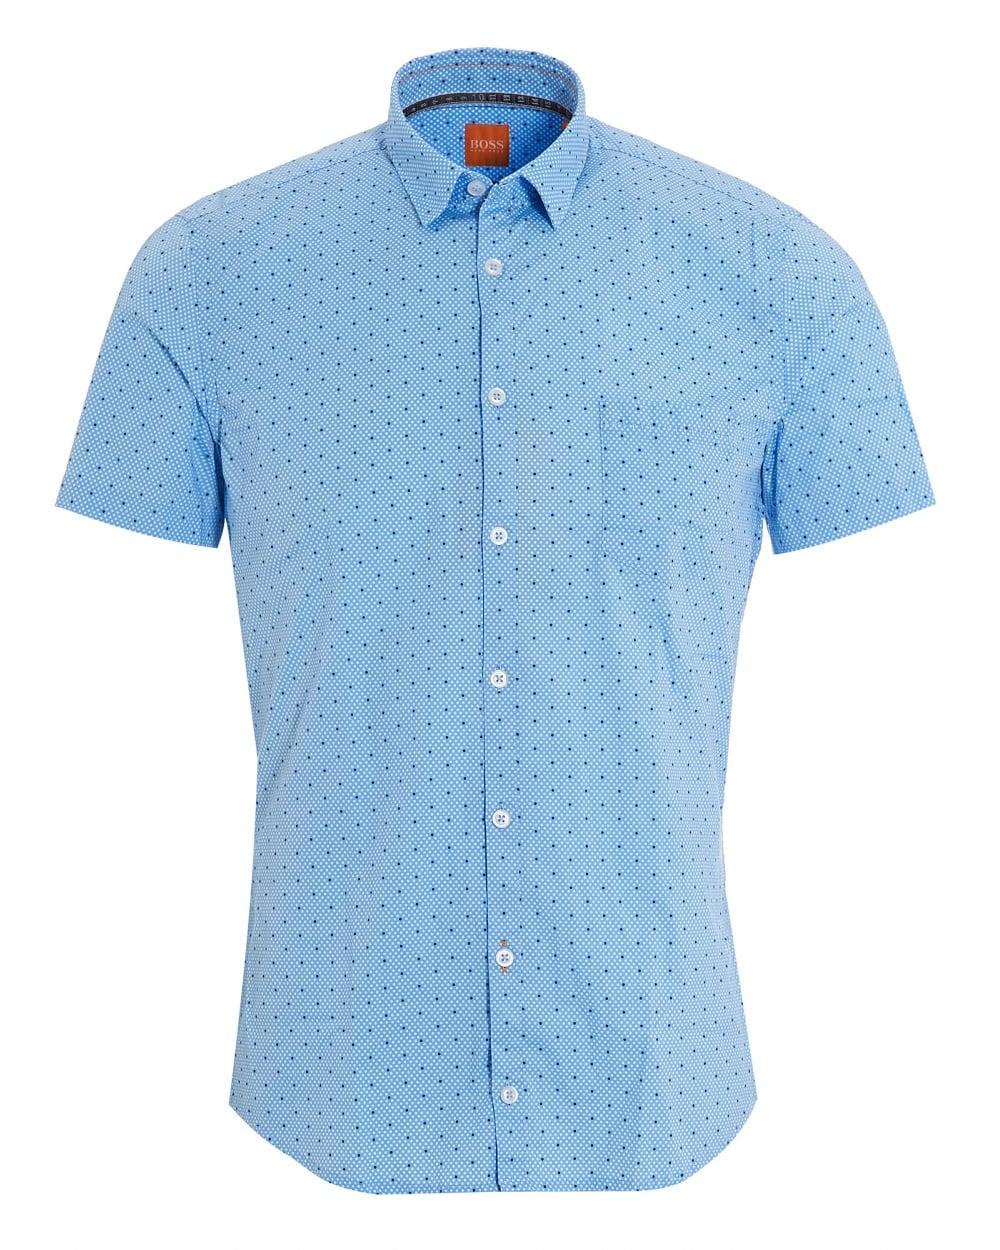 Hugo Boss Orange Mens Eglam Short Sleeve Blue Polka Dot Shirt